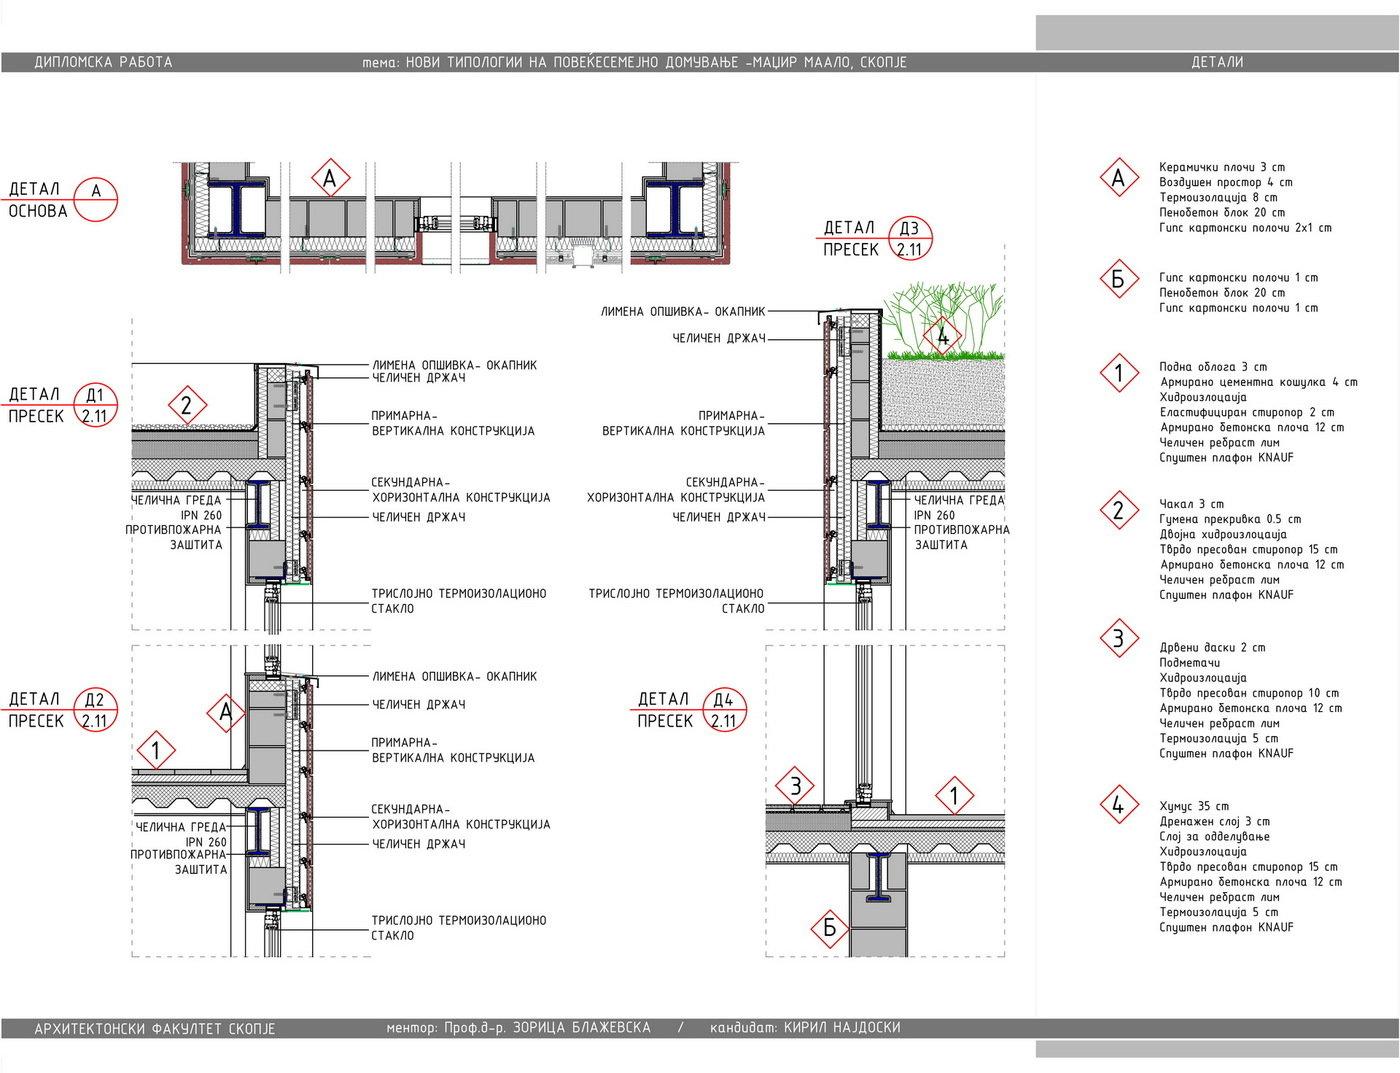 new typologies of multifamily housing by kiril najdoski at